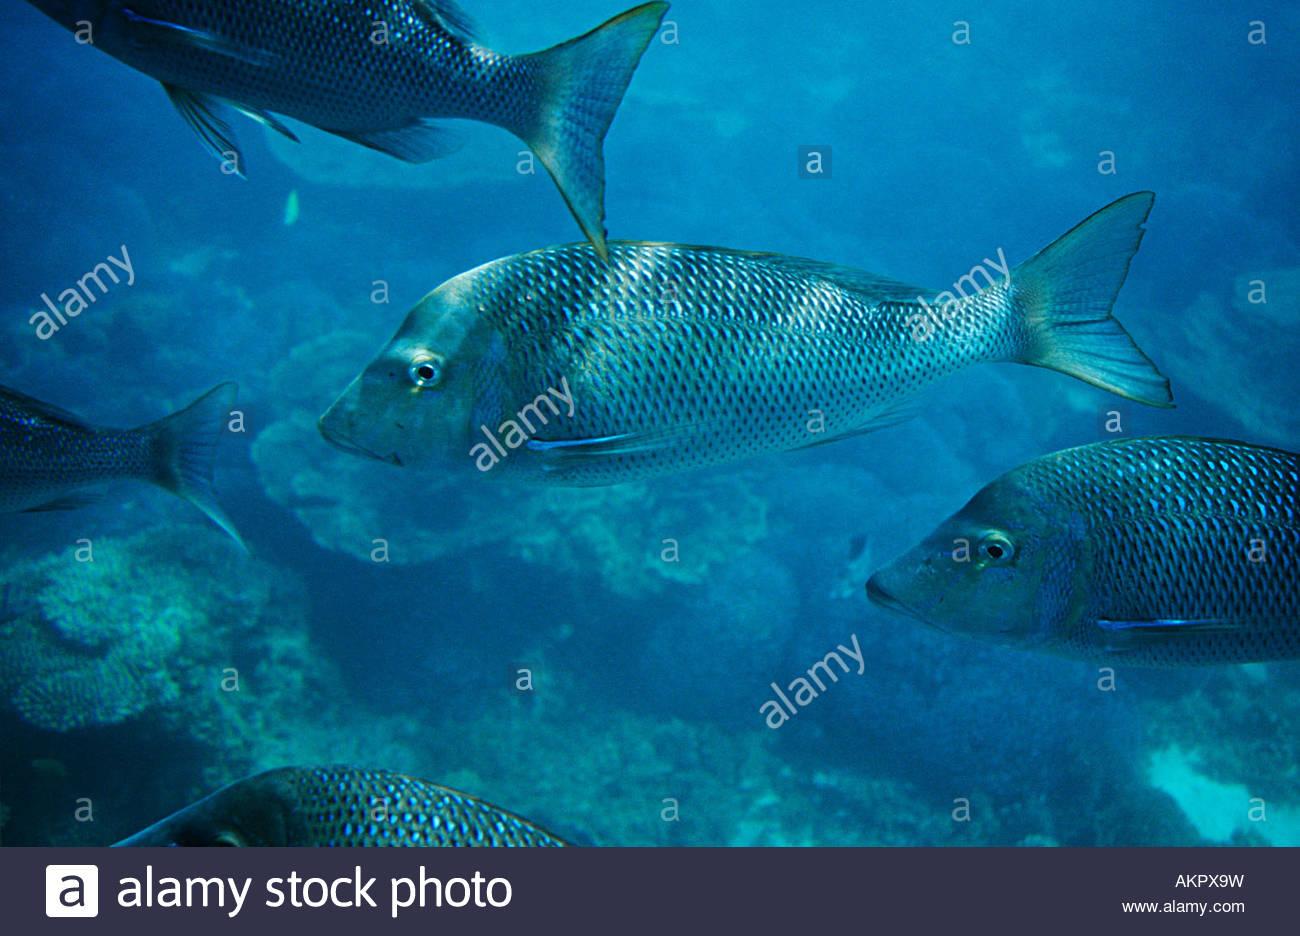 Spangled emperor fish - Stock Image